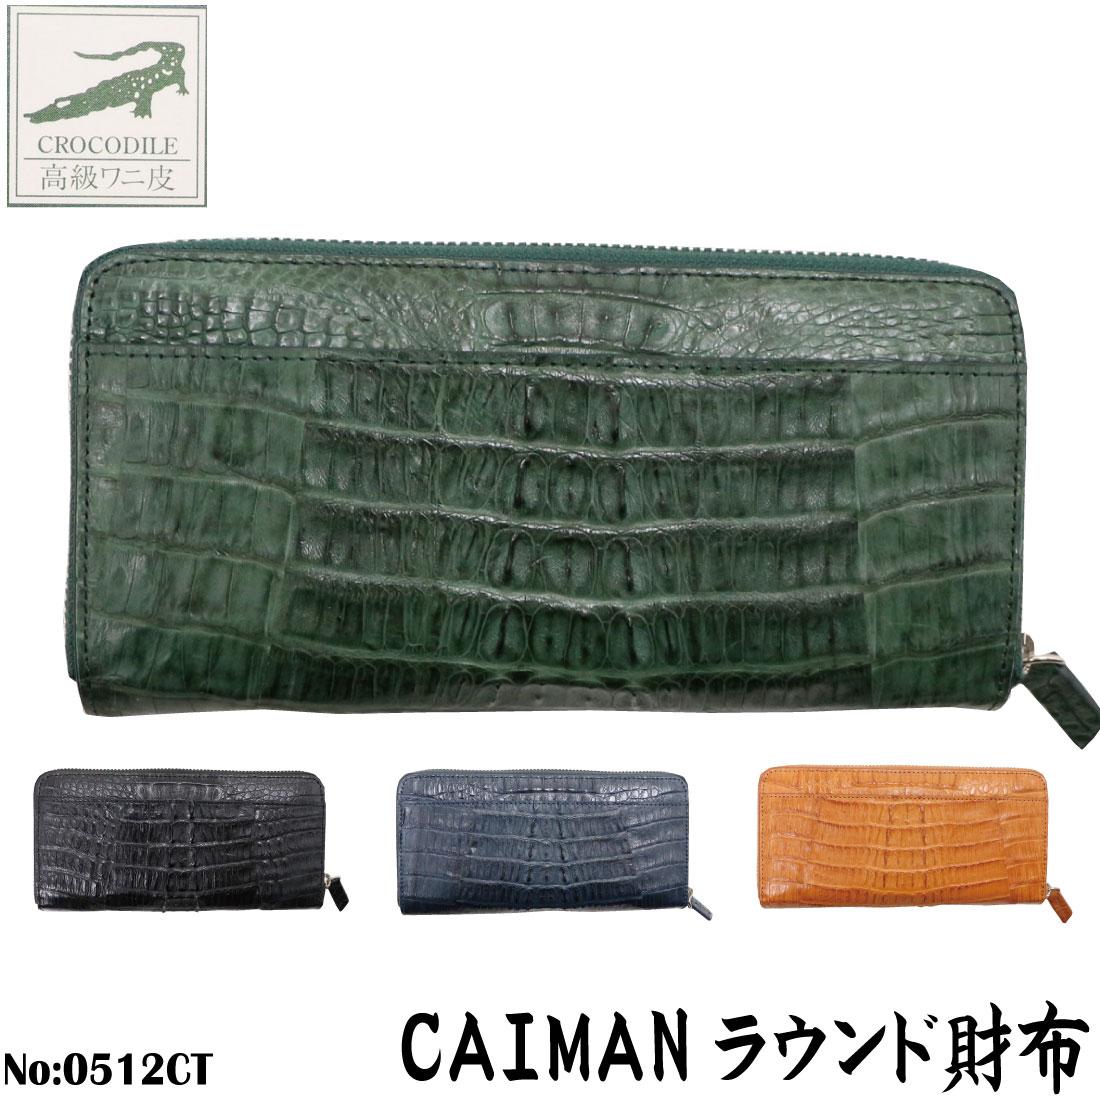 tachiya タチヤ CAIMAN 長財布 ラウンド ファスナー ウォレット ワニ カイマン 0512CT メンズ プレゼント 本革